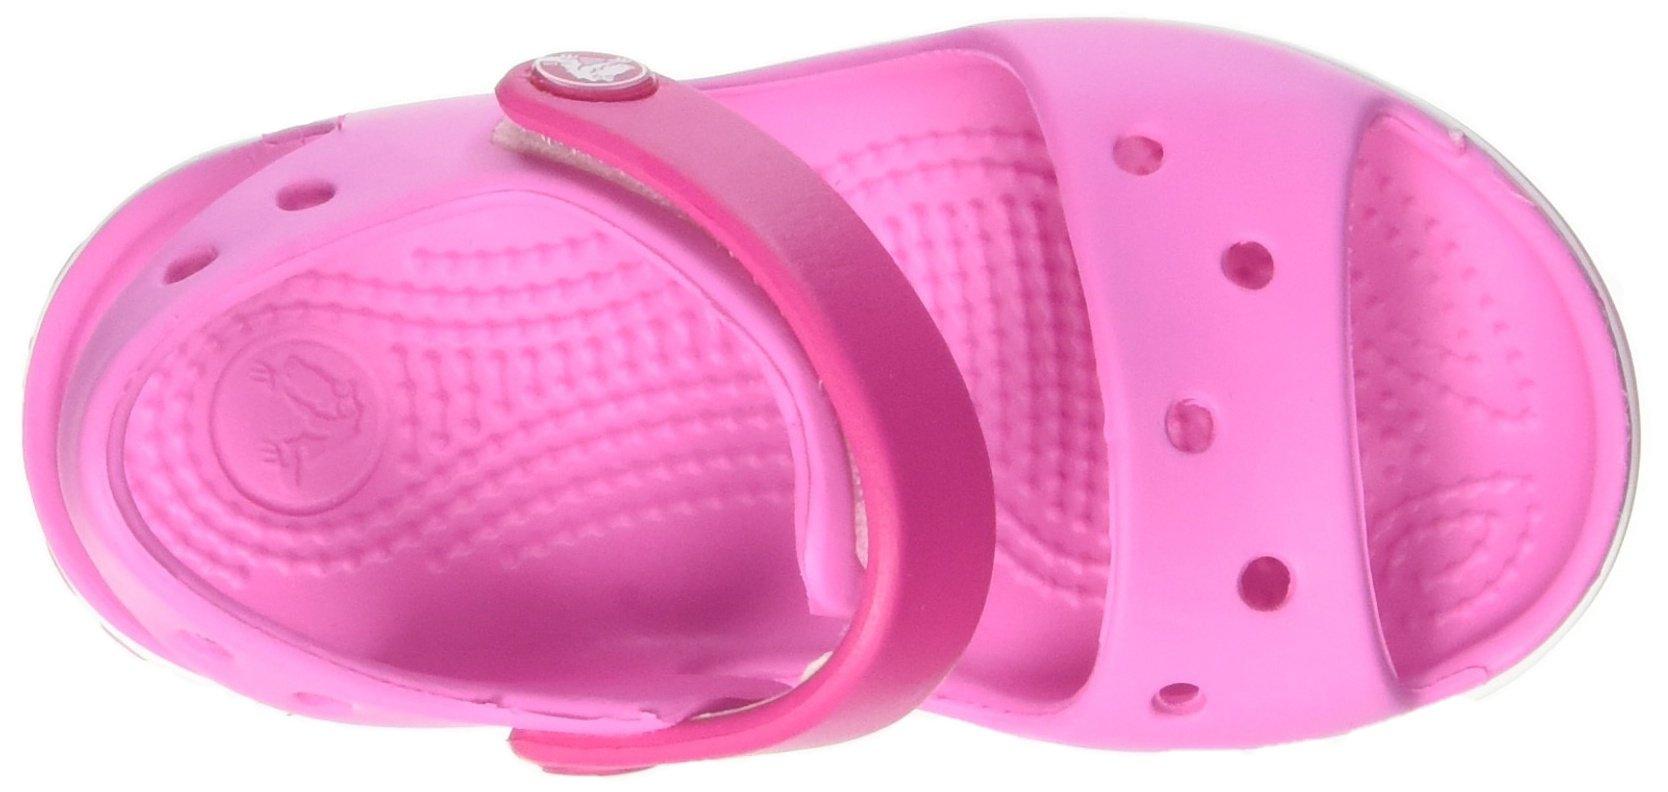 Crocs Crocband  Fun Lab   Light-Up Clog, Pink, C6 M US Toddler by Crocs (Image #16)